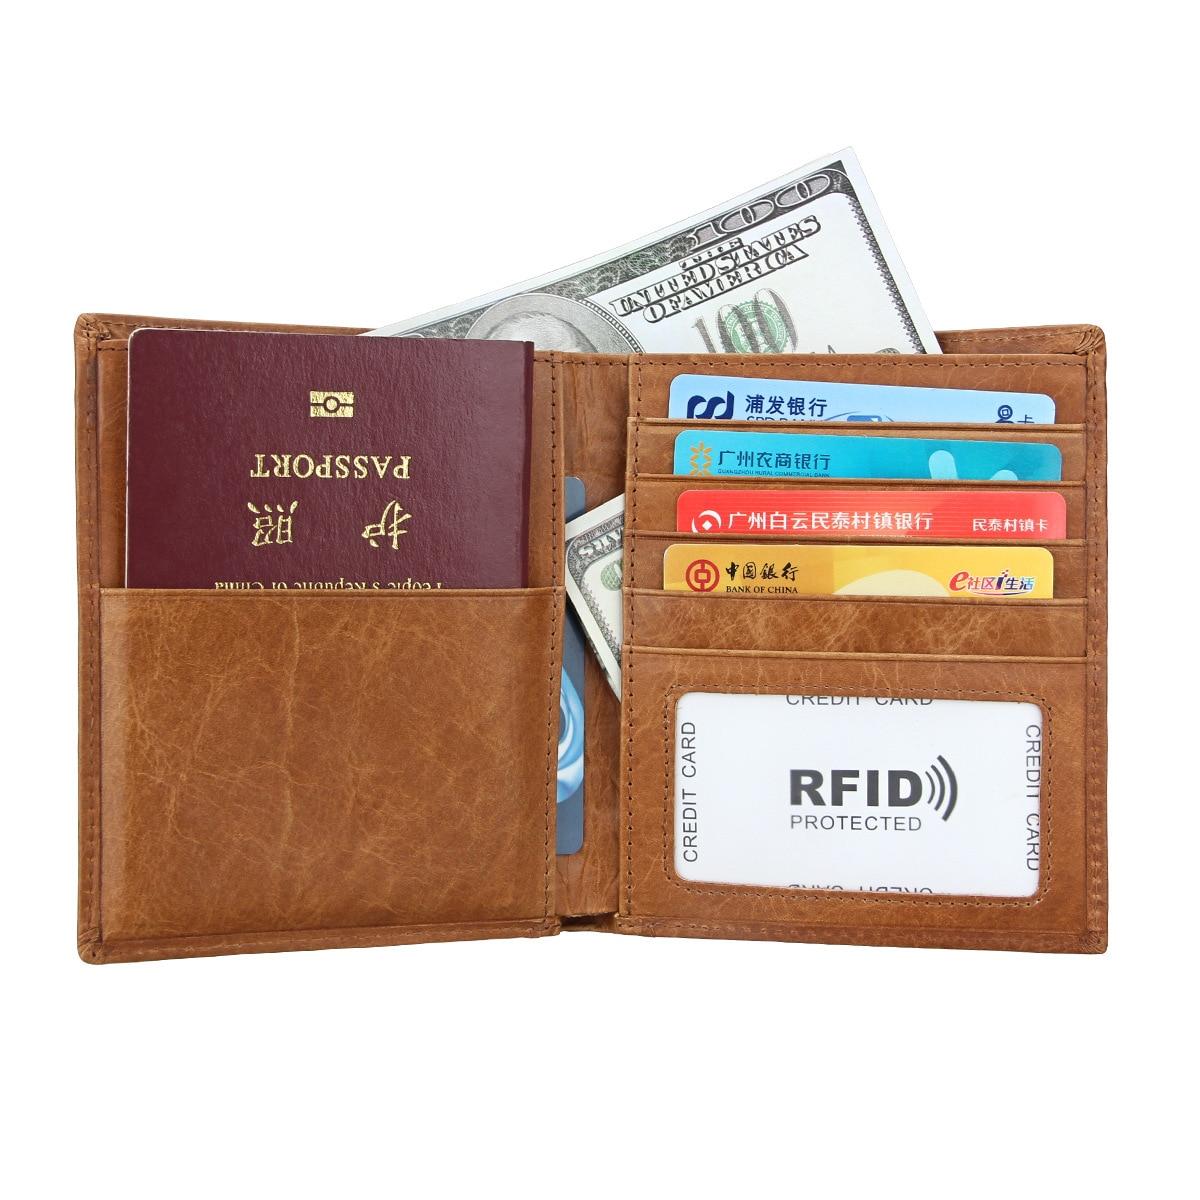 Passport holder Genuine Leather business card holder multifunction Business card wallet Unisex package id card holder